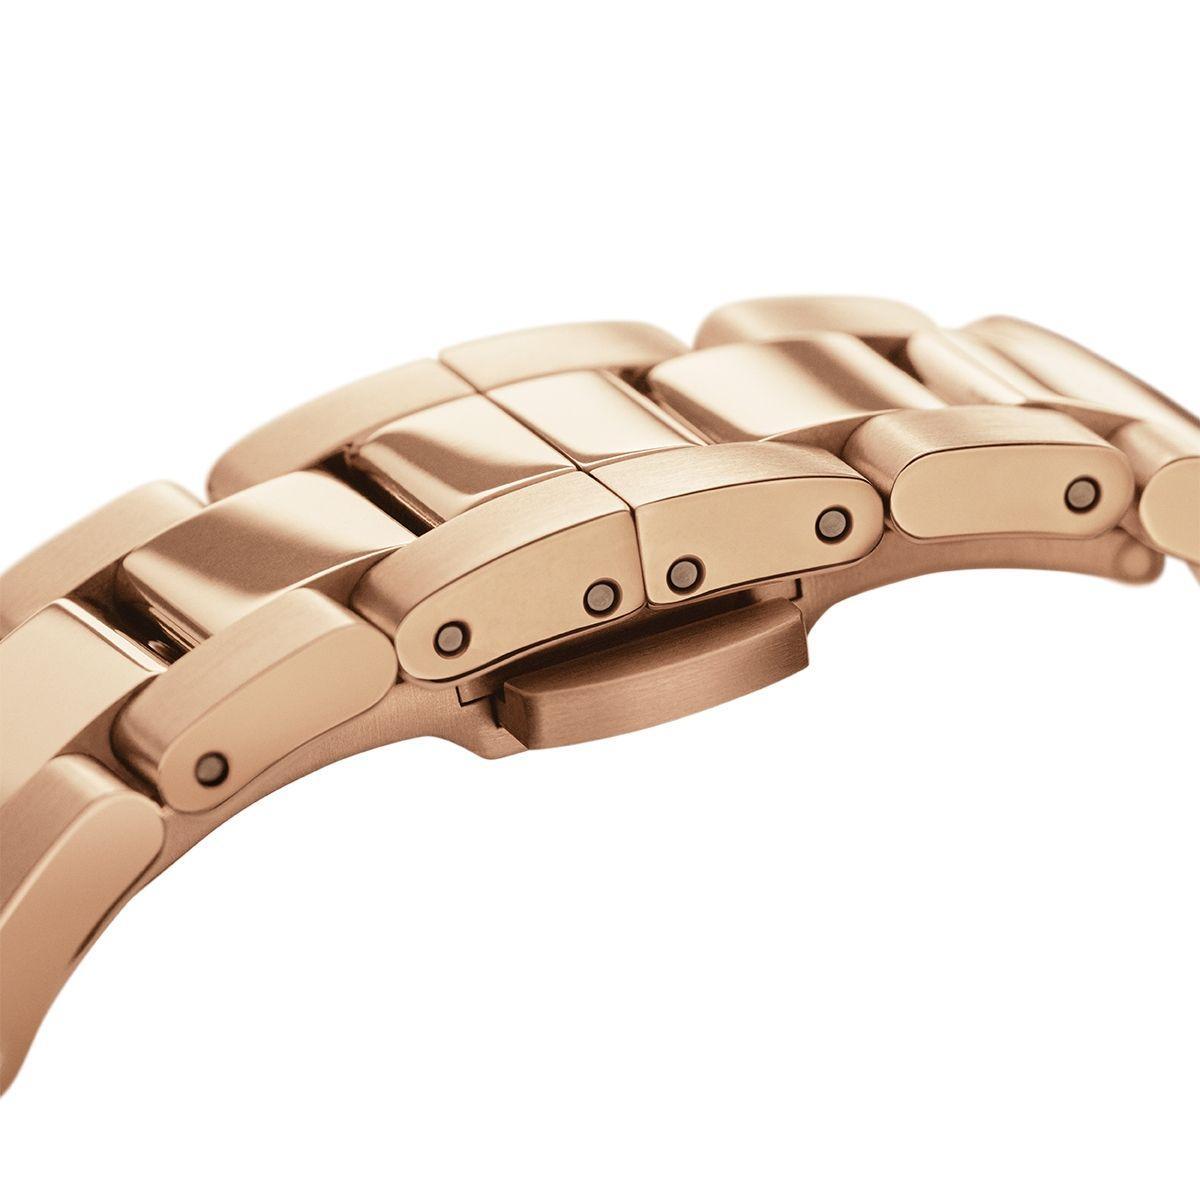 dw官网 dw手表官网 dw中国官网 dw官方旗舰店 DW DW官网  Watch Iconic Link RG 40mm